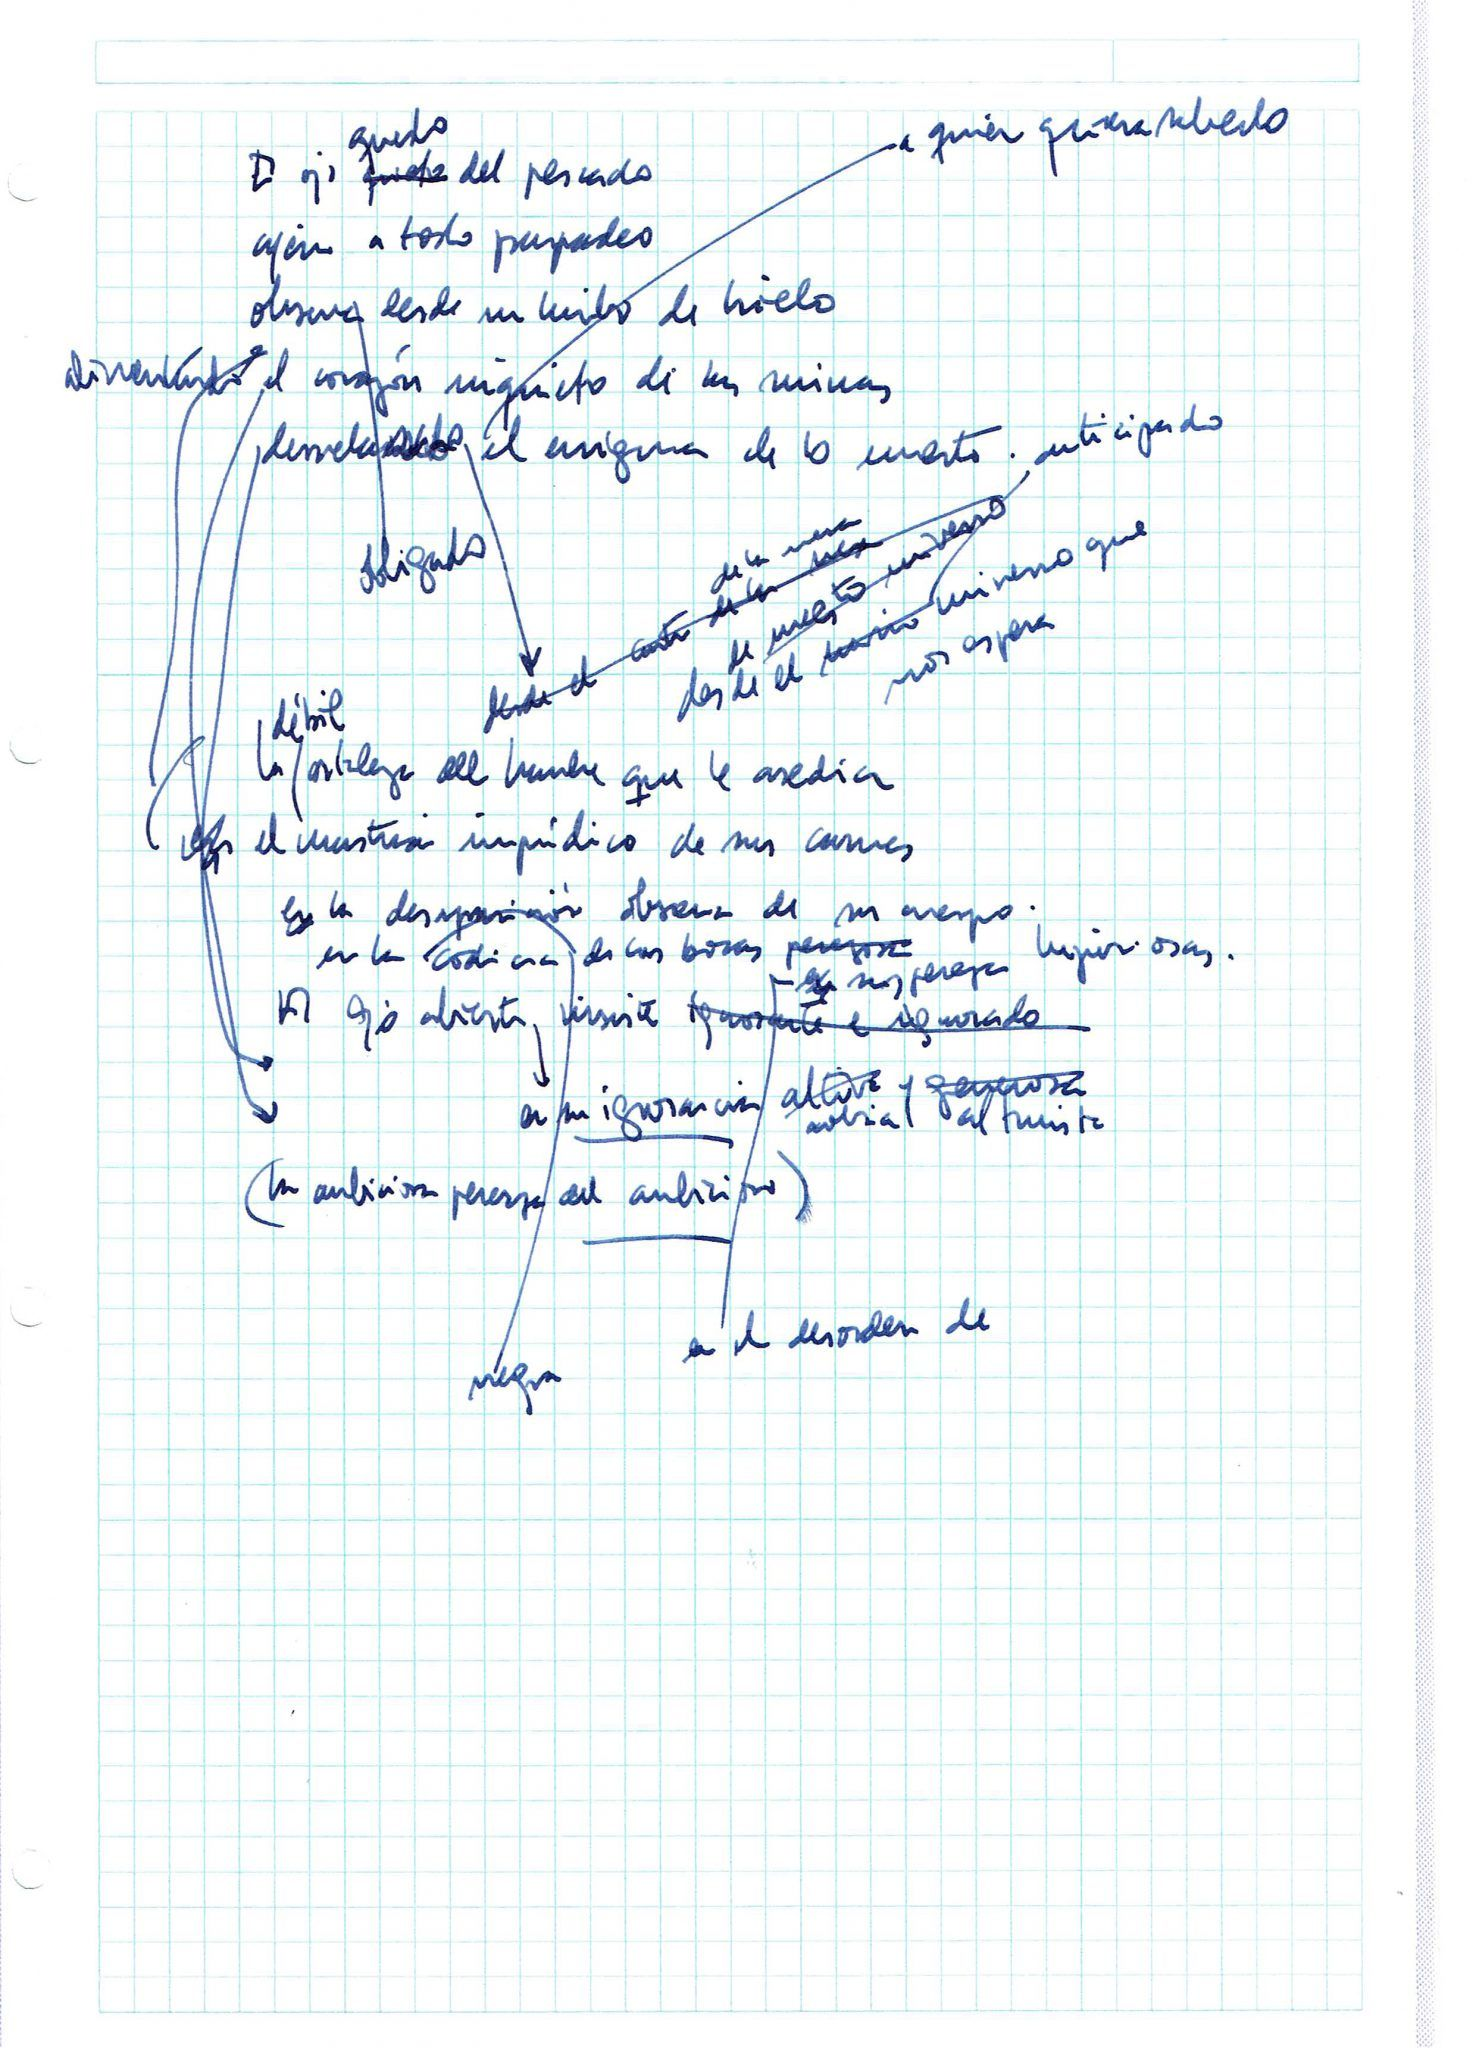 Texto manuscrito nº 39